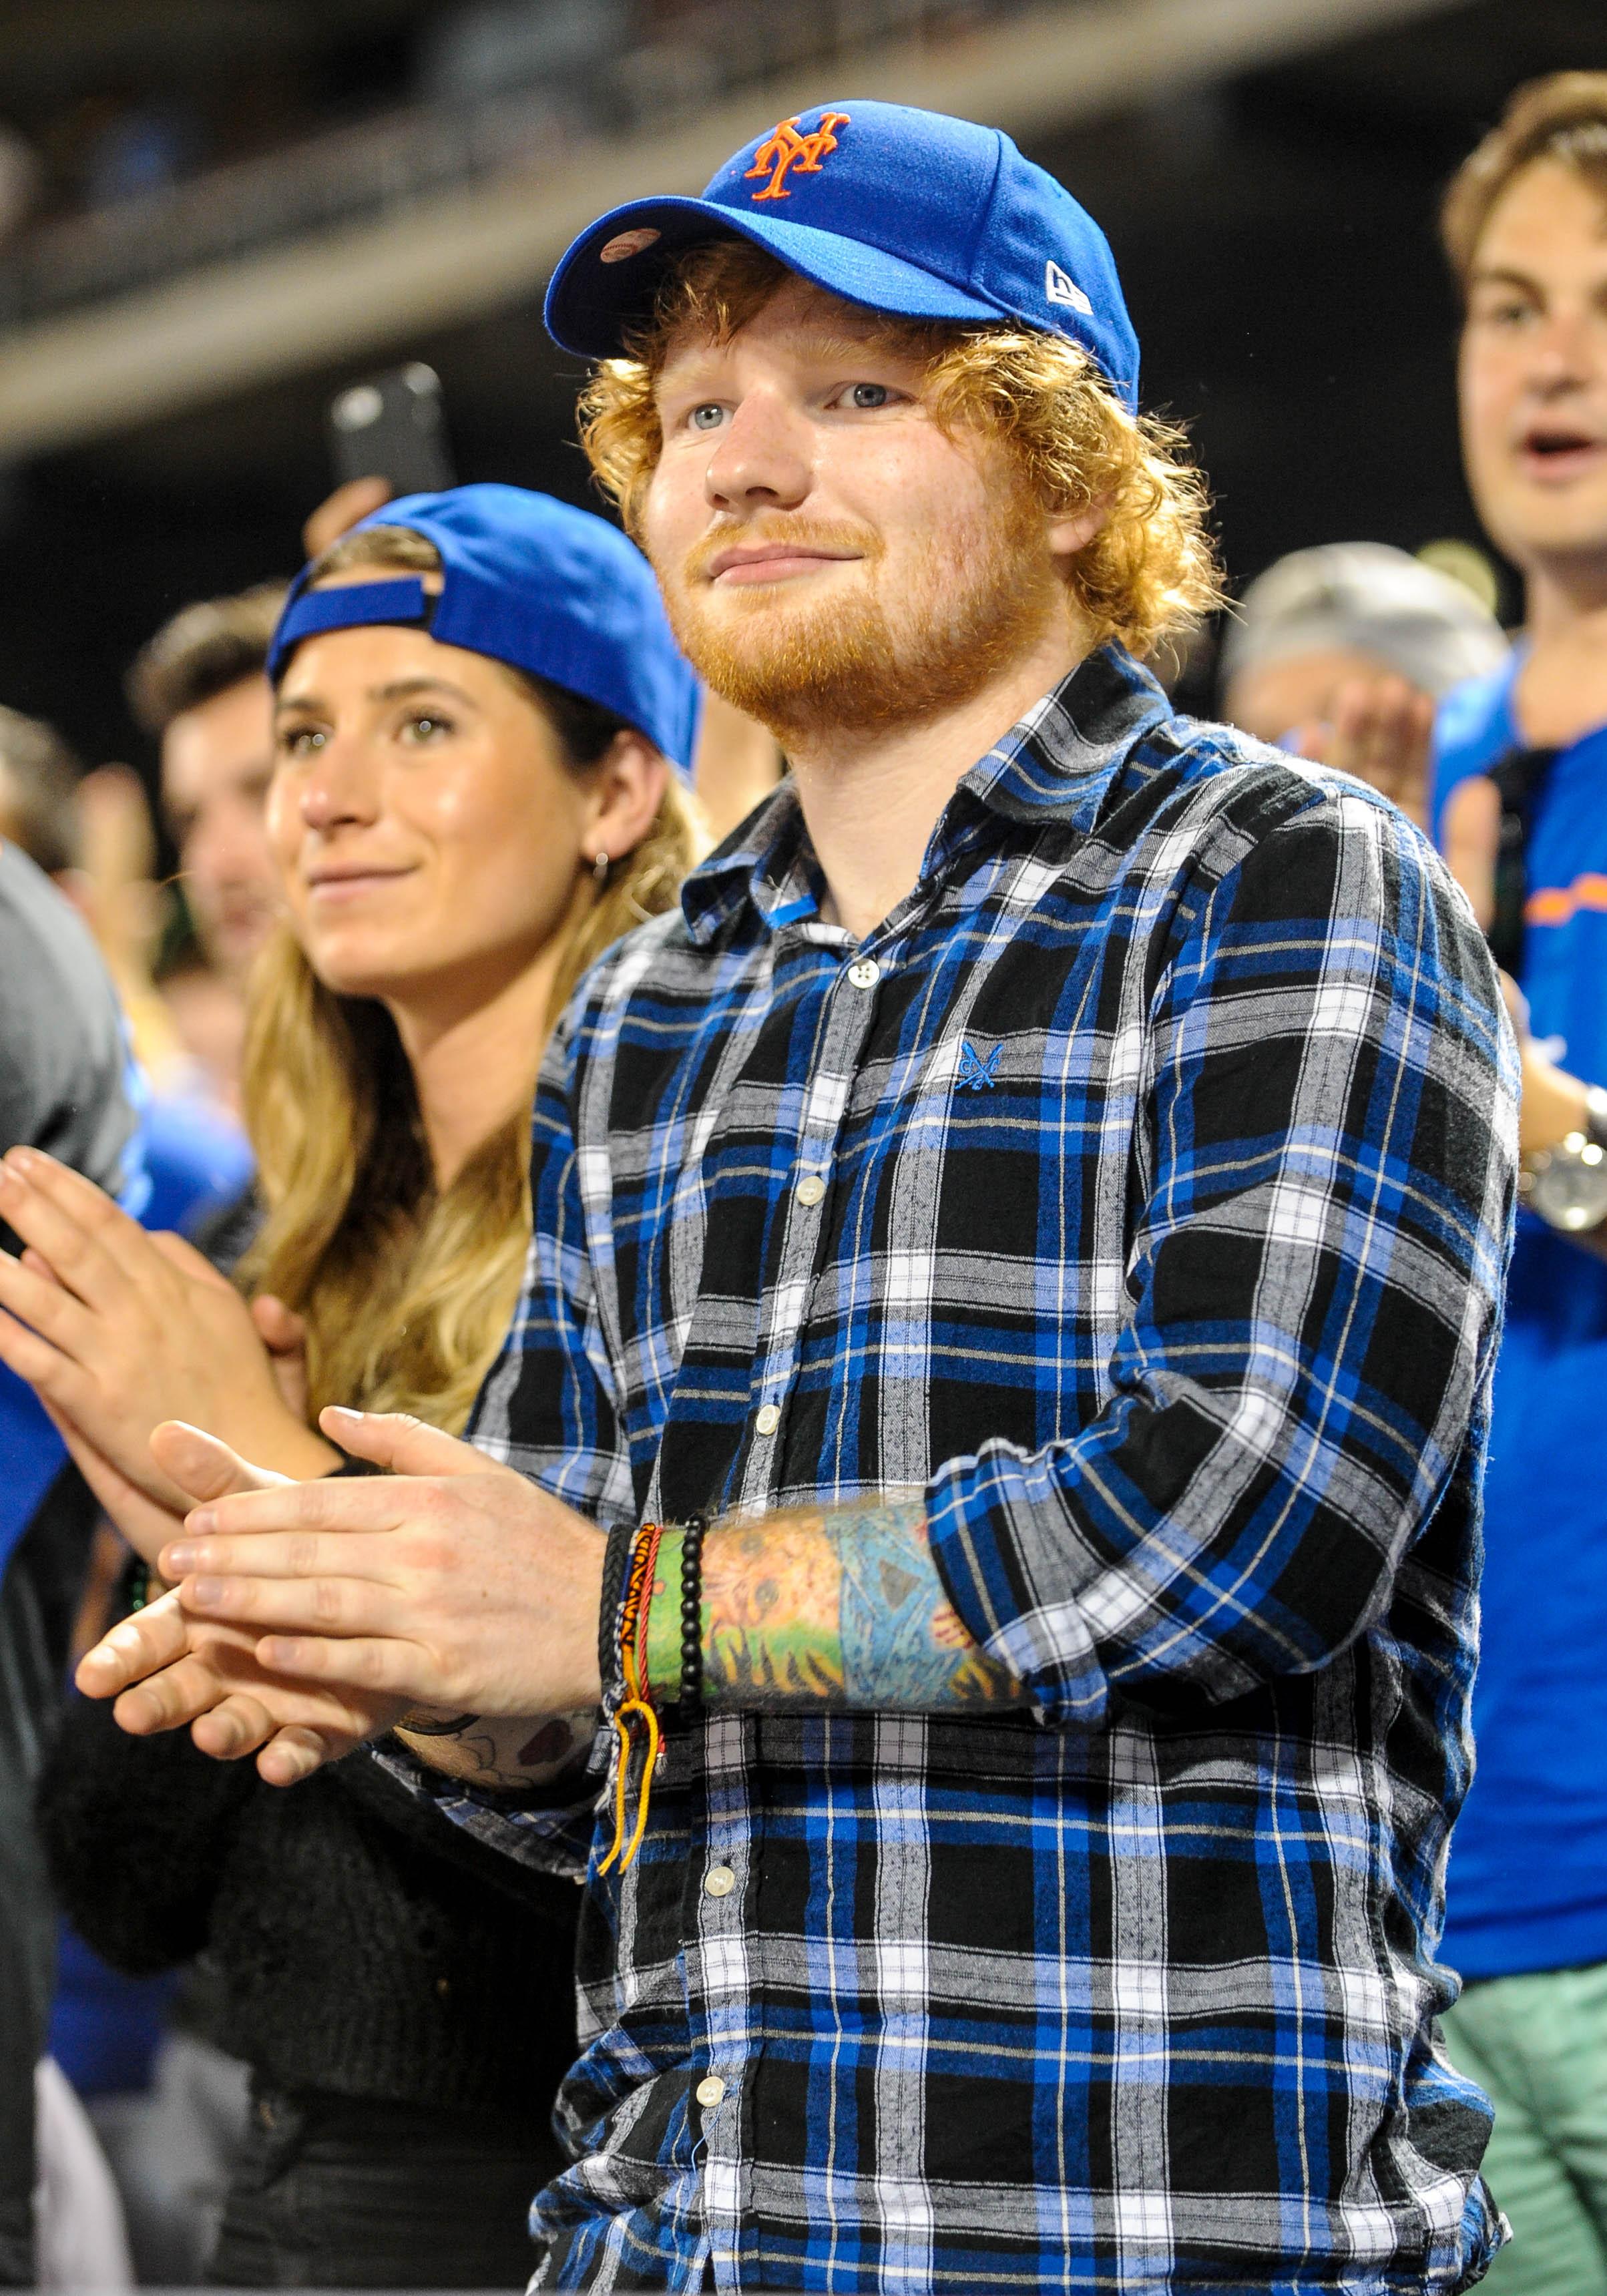 Ed Sheeran girlfriend